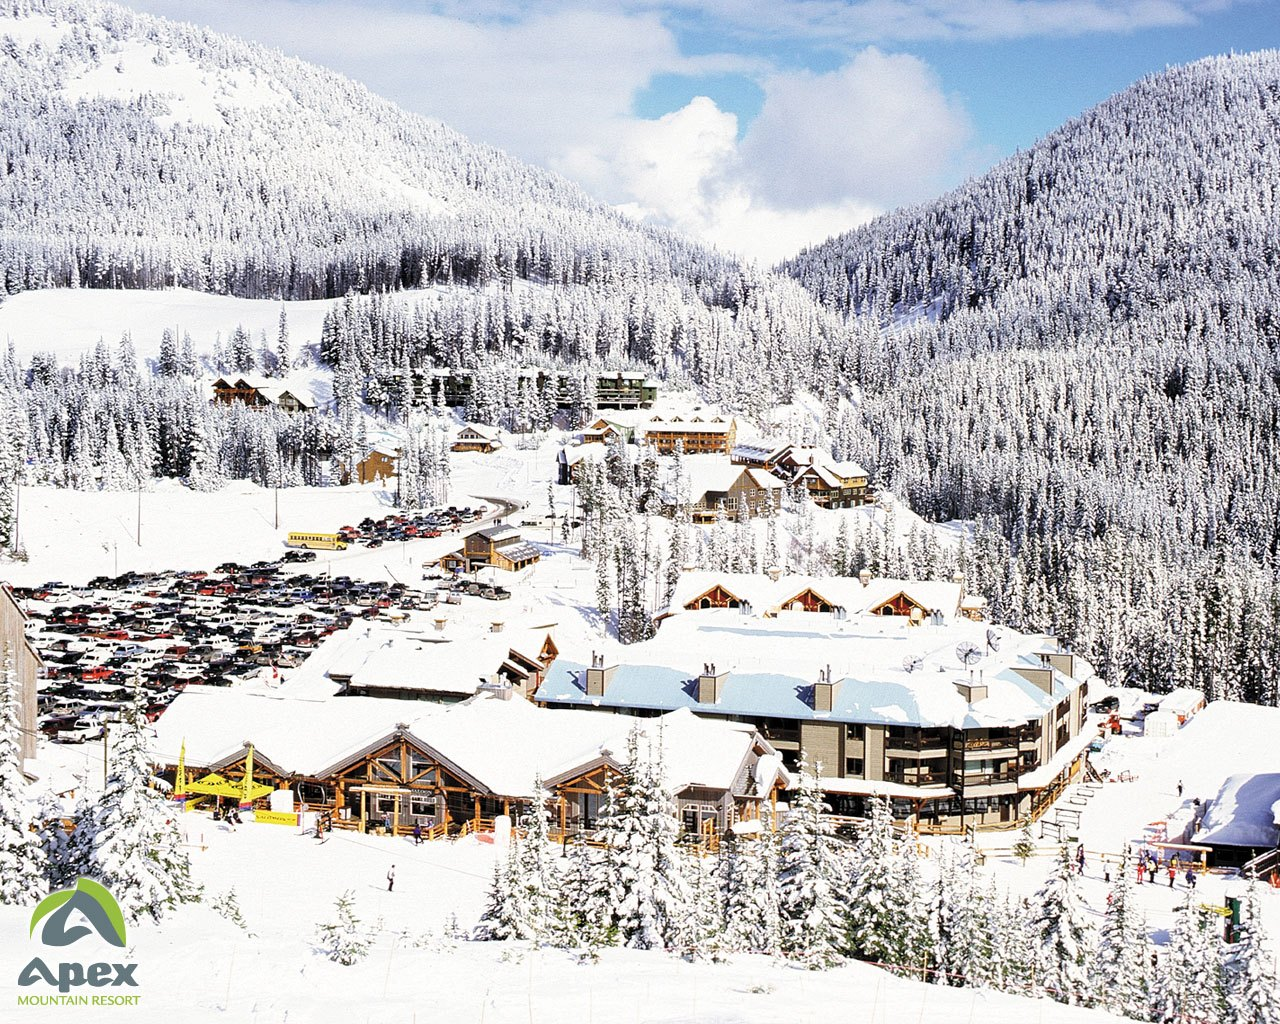 (Apex Mountain Resort)